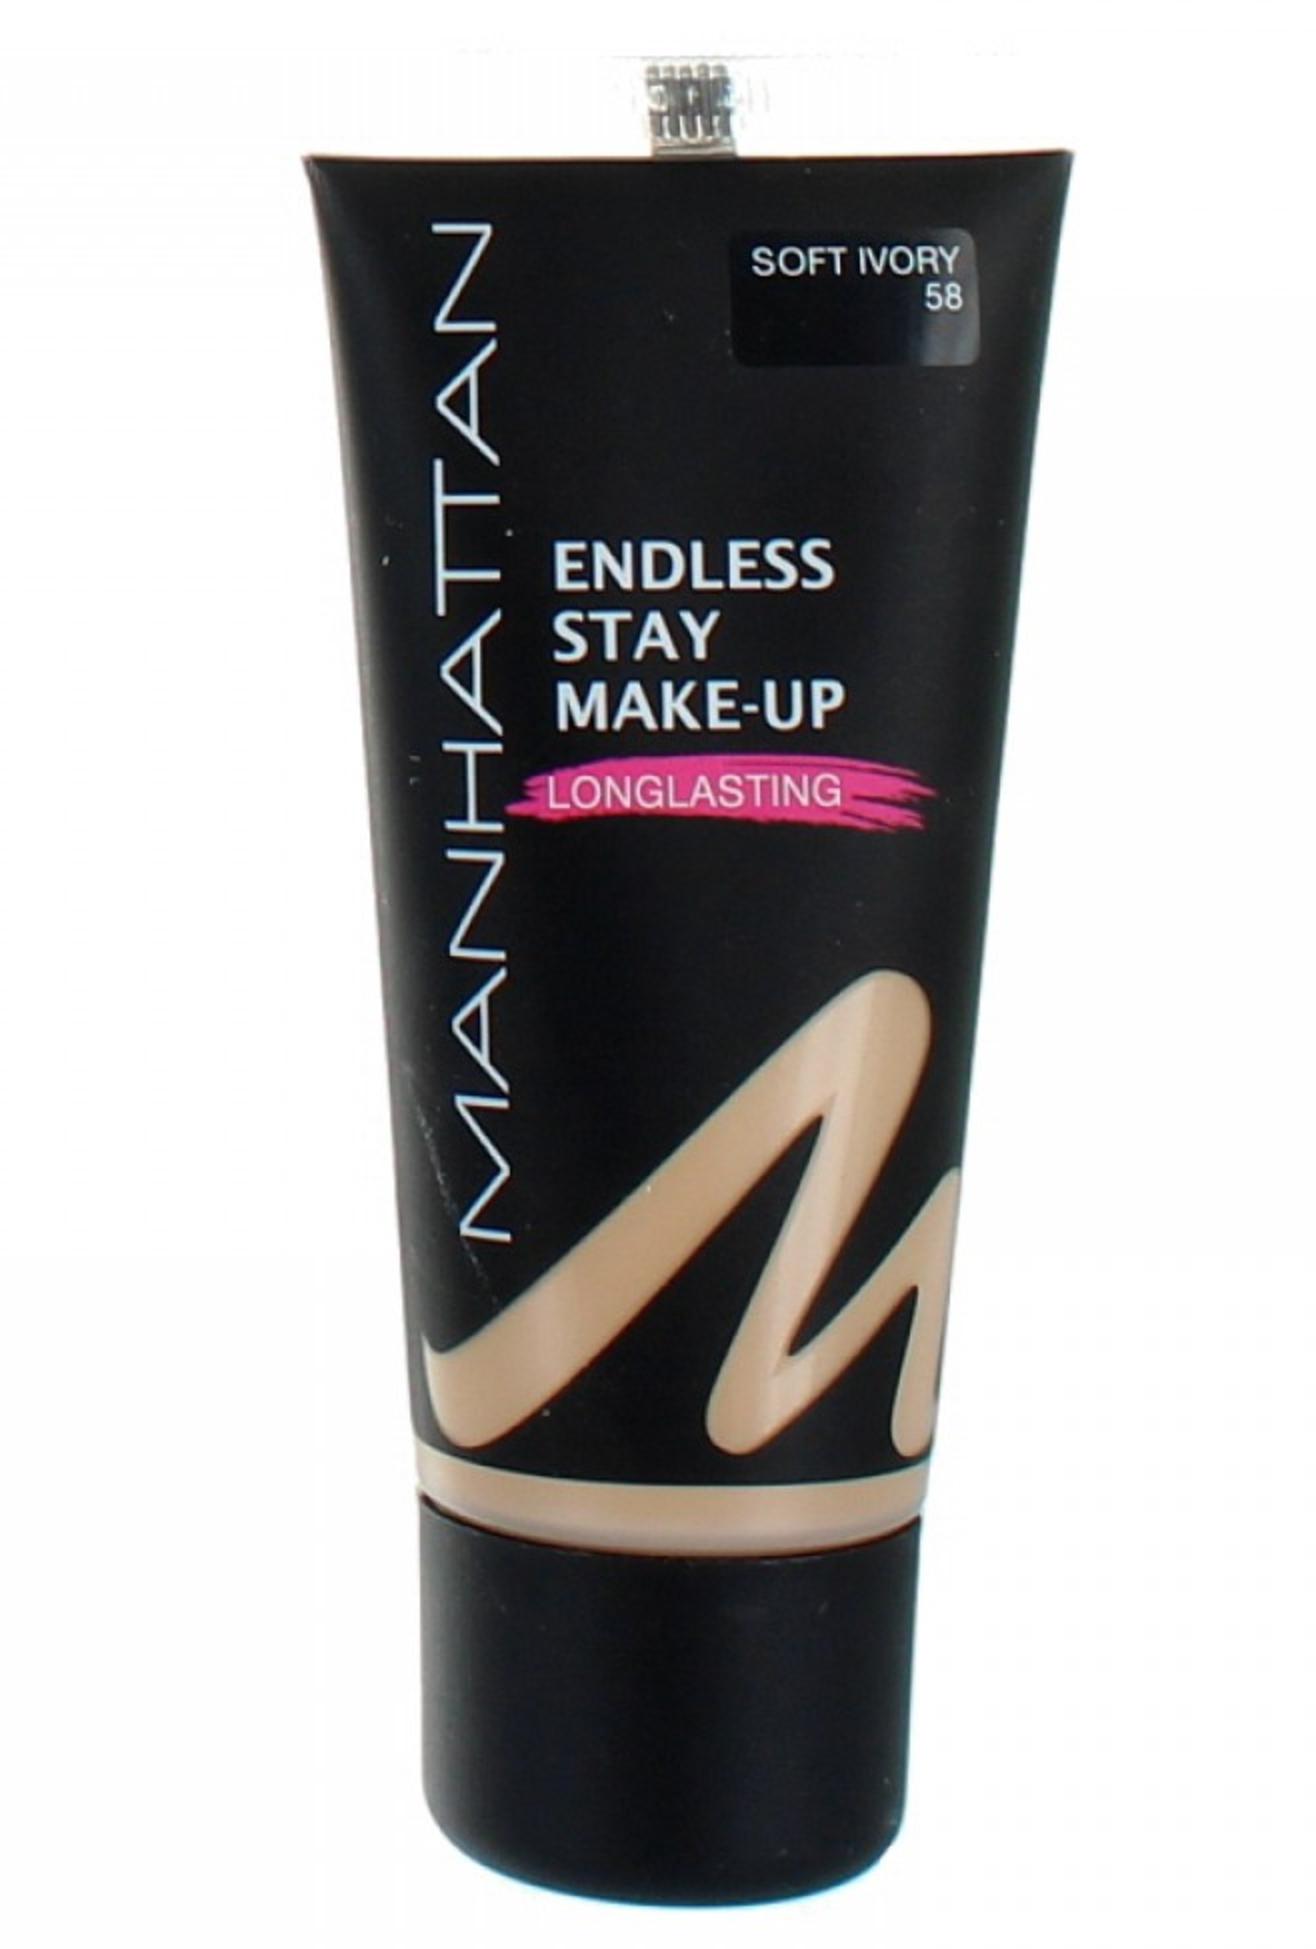 Manhattan Endless Stay Make-Up Foundation - 58 Soft Ivory